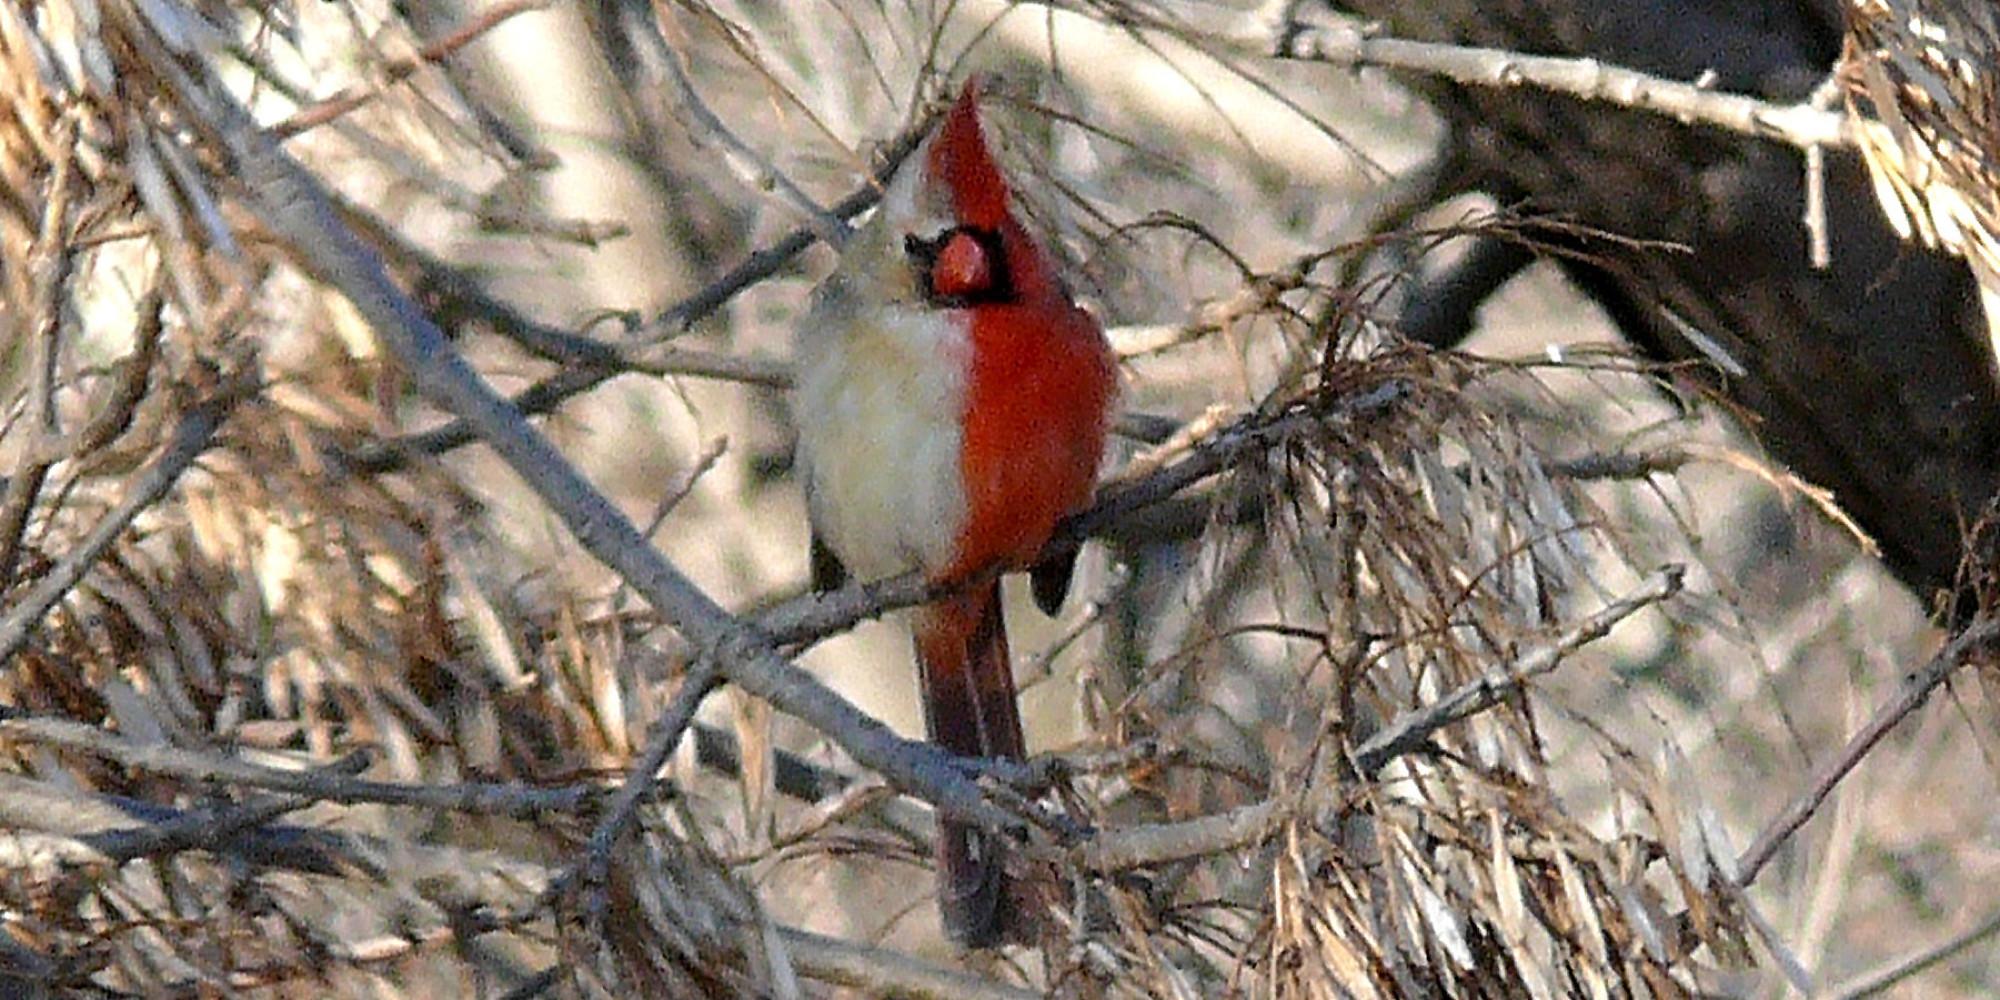 This Half-Male, Half-Female Bird Has Very Peculiar Plumage ...